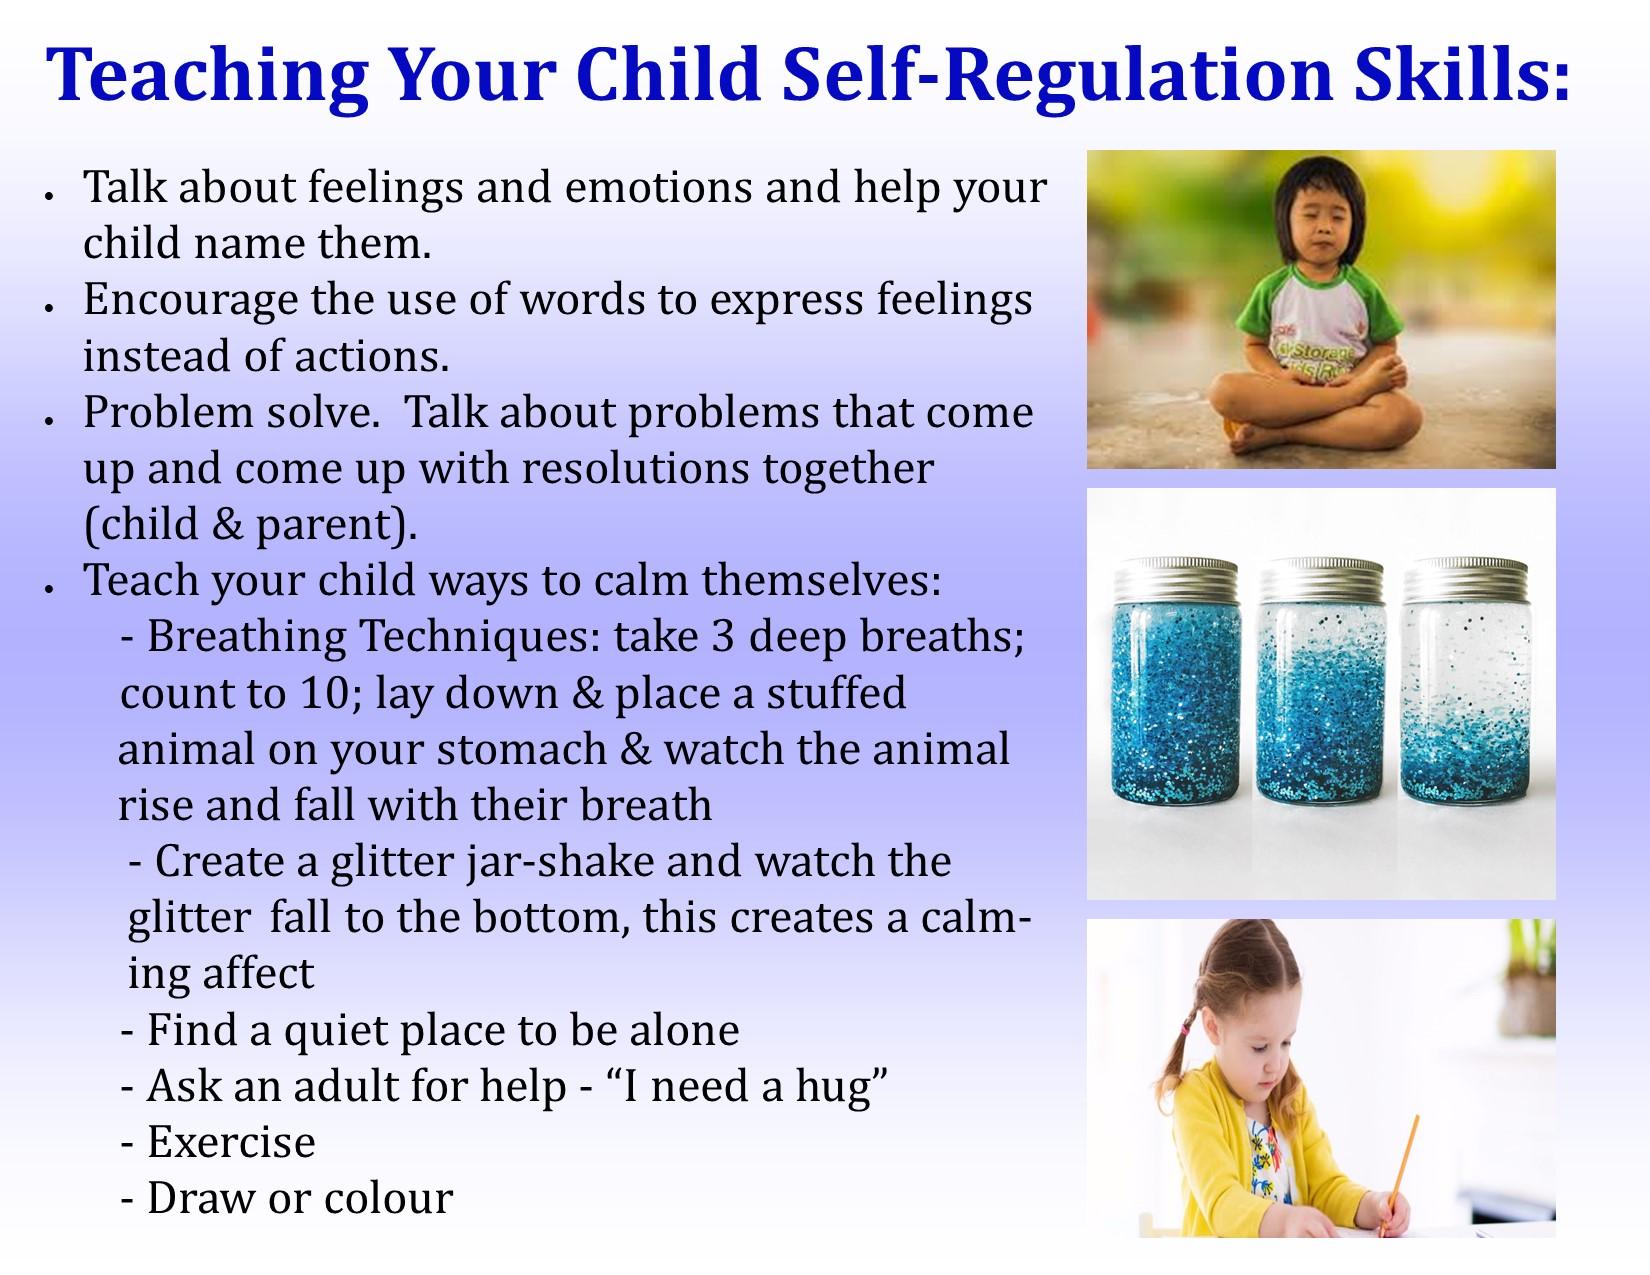 Teaching your child self-regulation skills